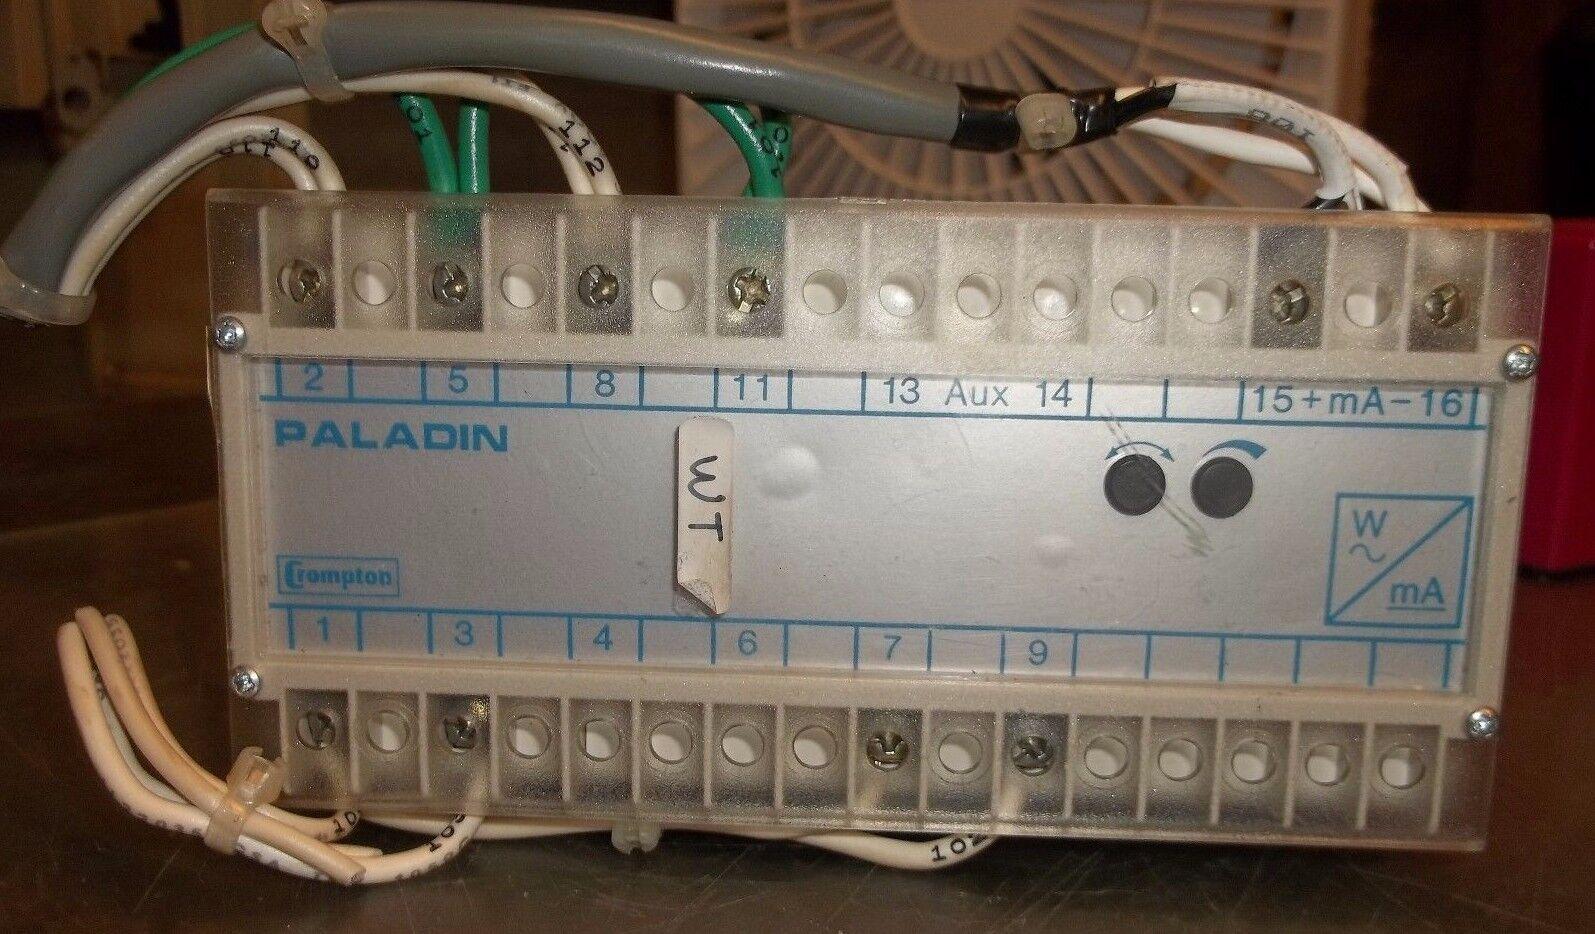 CROMPTON PALADIN 256-TWMU-QQFA TRANSDUCER MODULE 0  KW 369633-017 1MADC  (AA3)